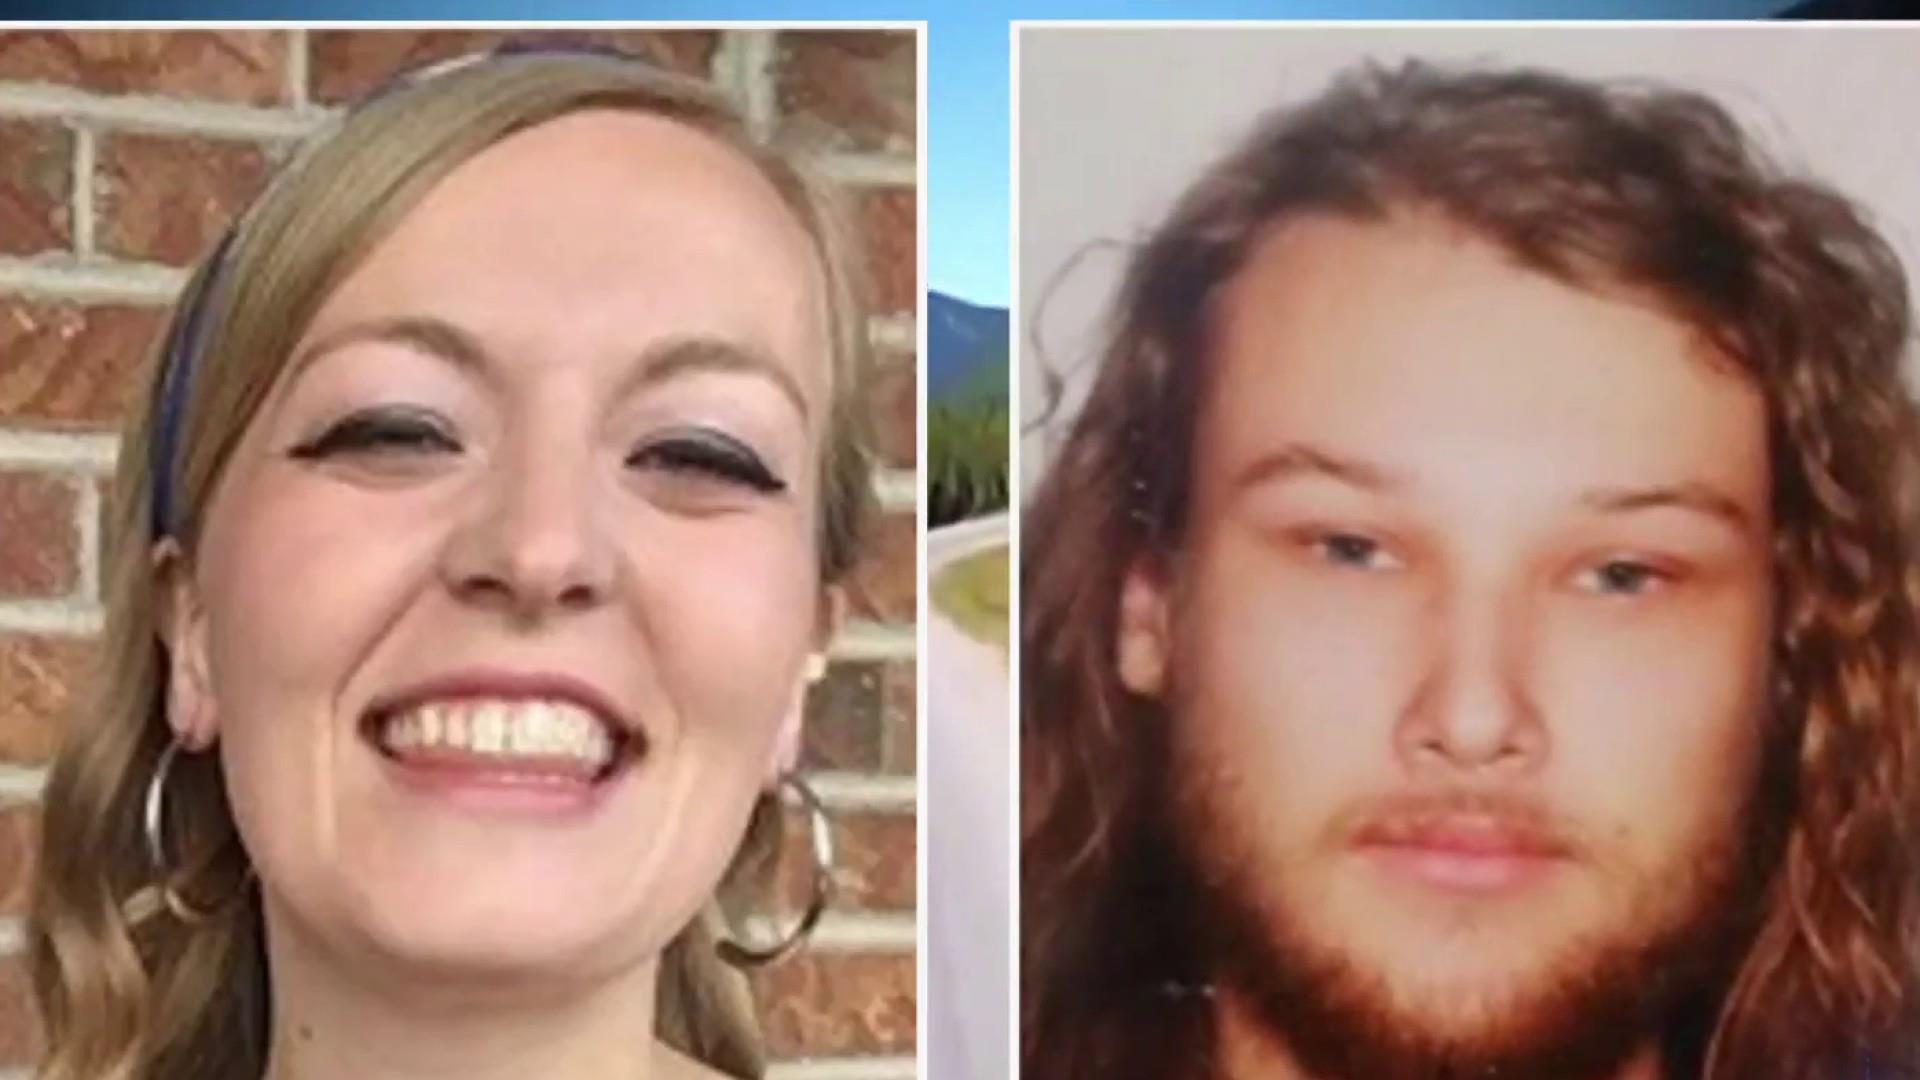 24-year-old U.S. woman and Australian boyfriend were on road trip in Canada when they were killed